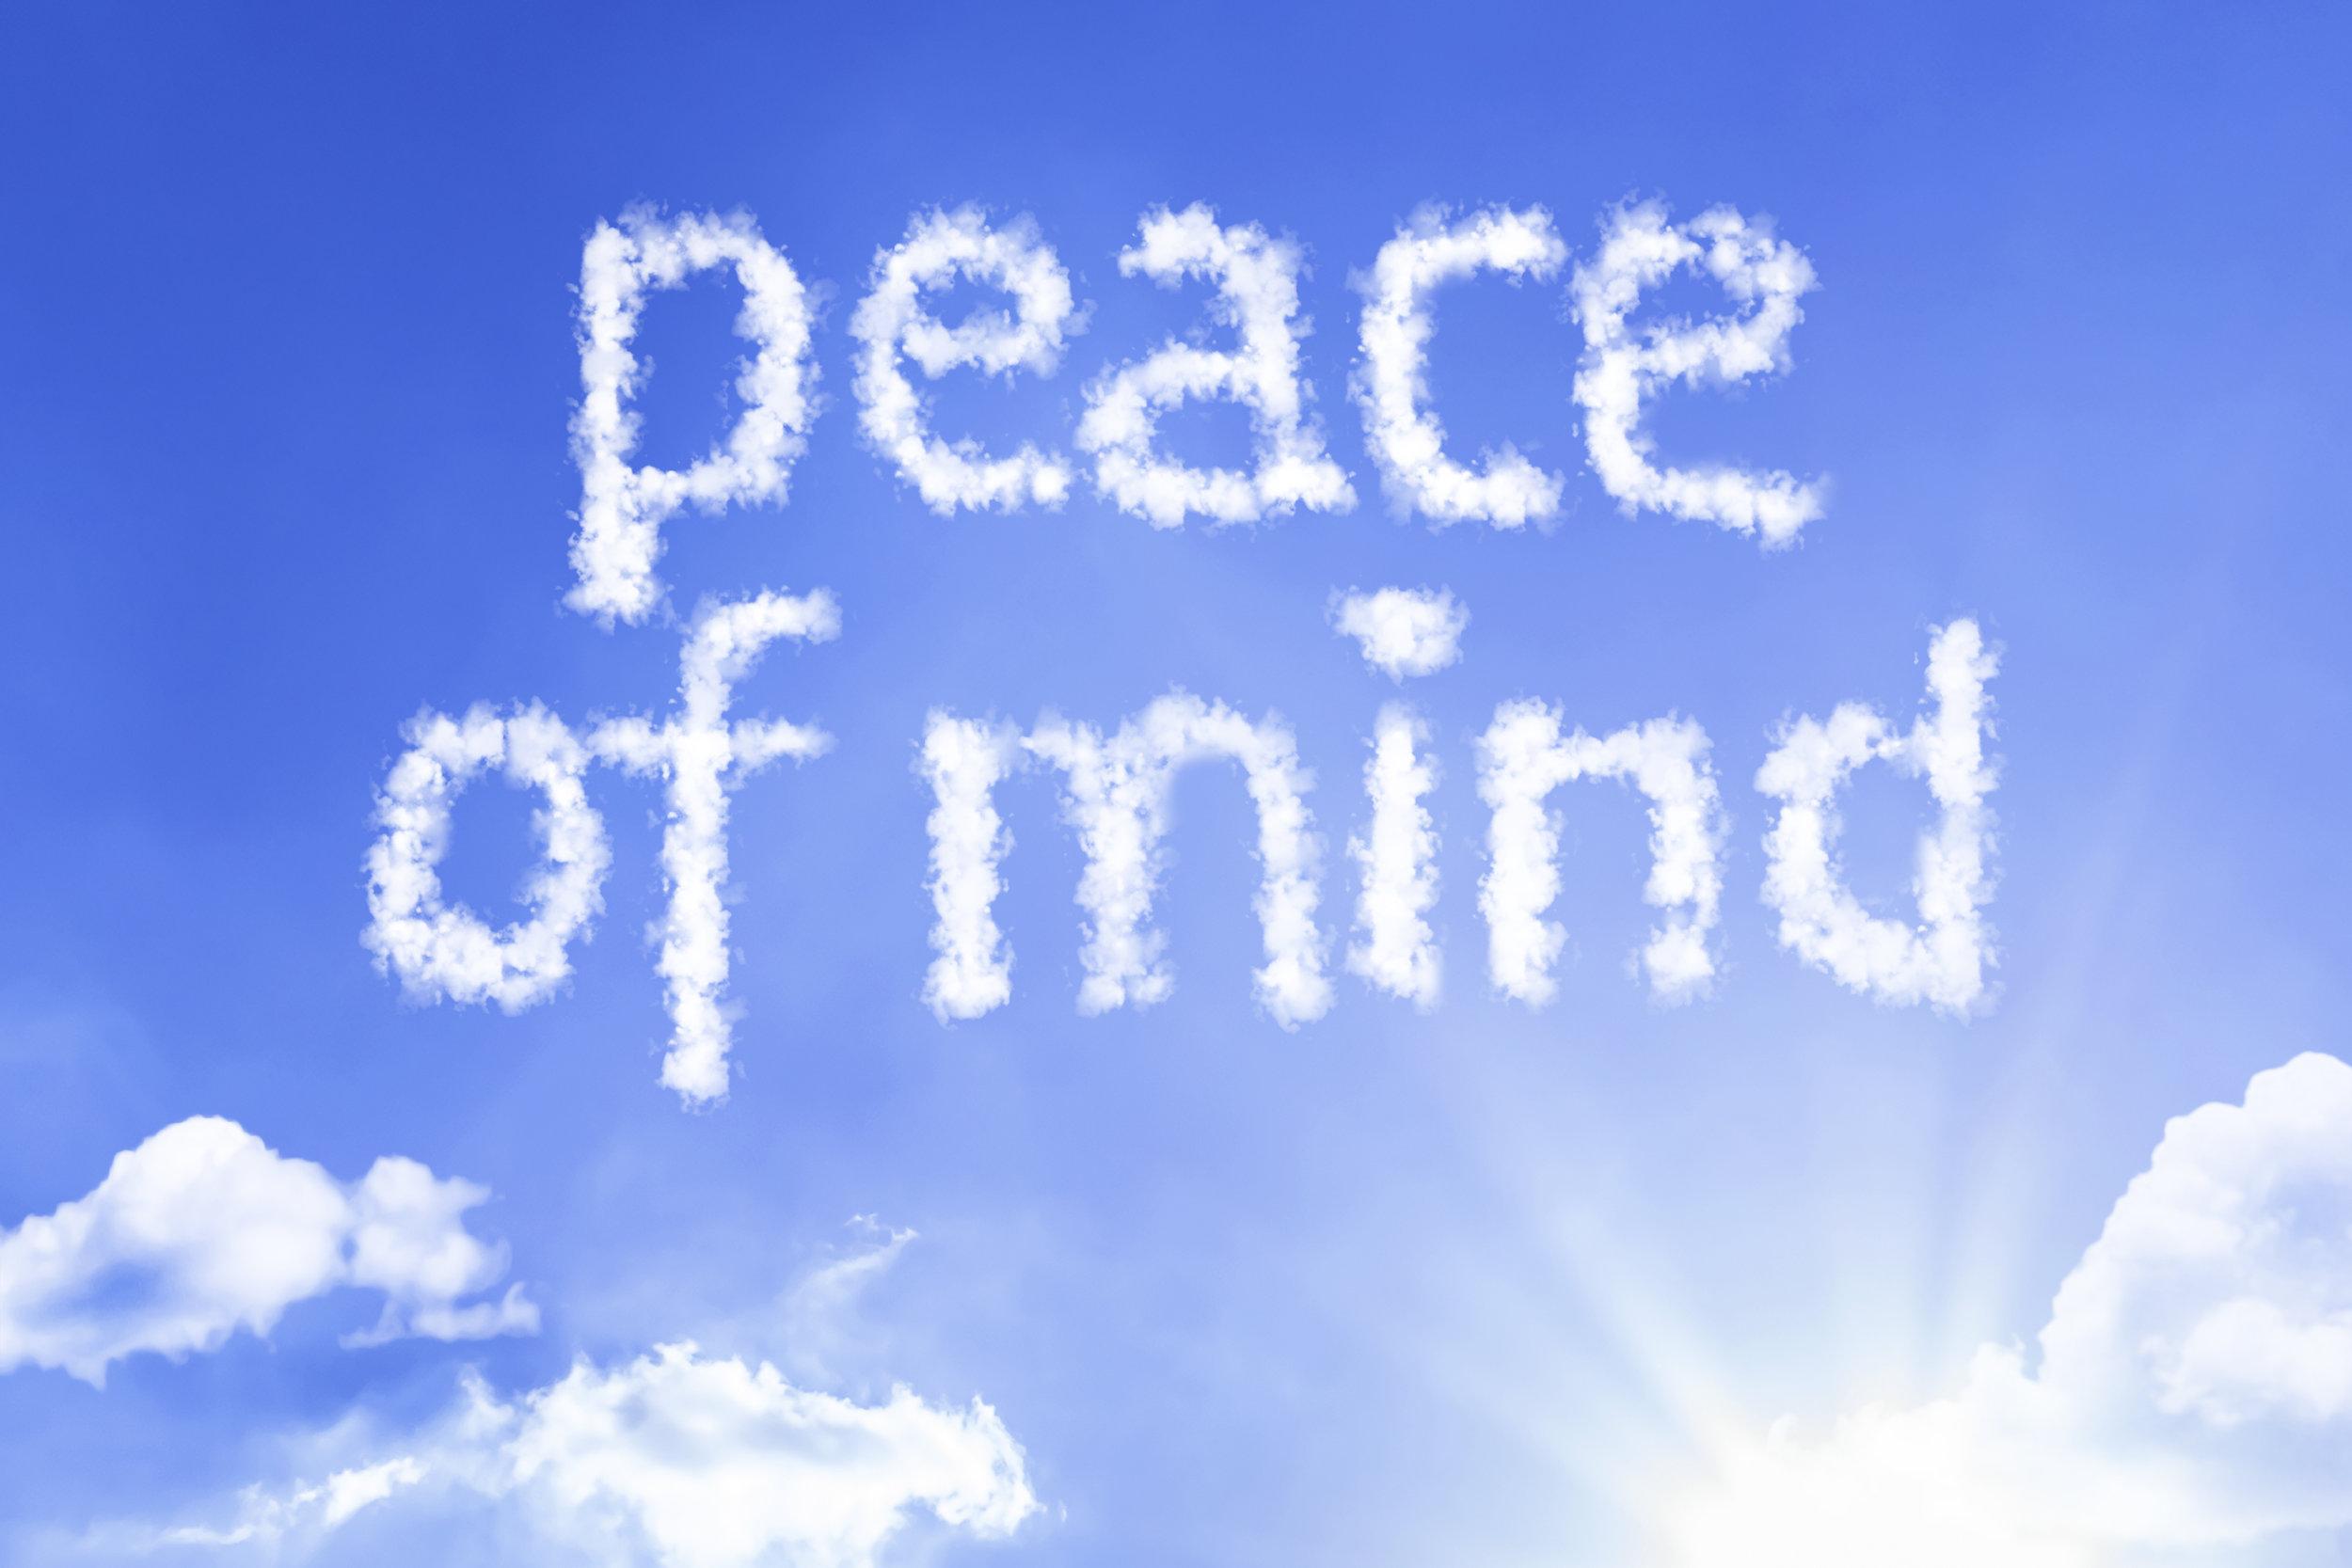 peace-of-mind-written-in-clouds.jpg